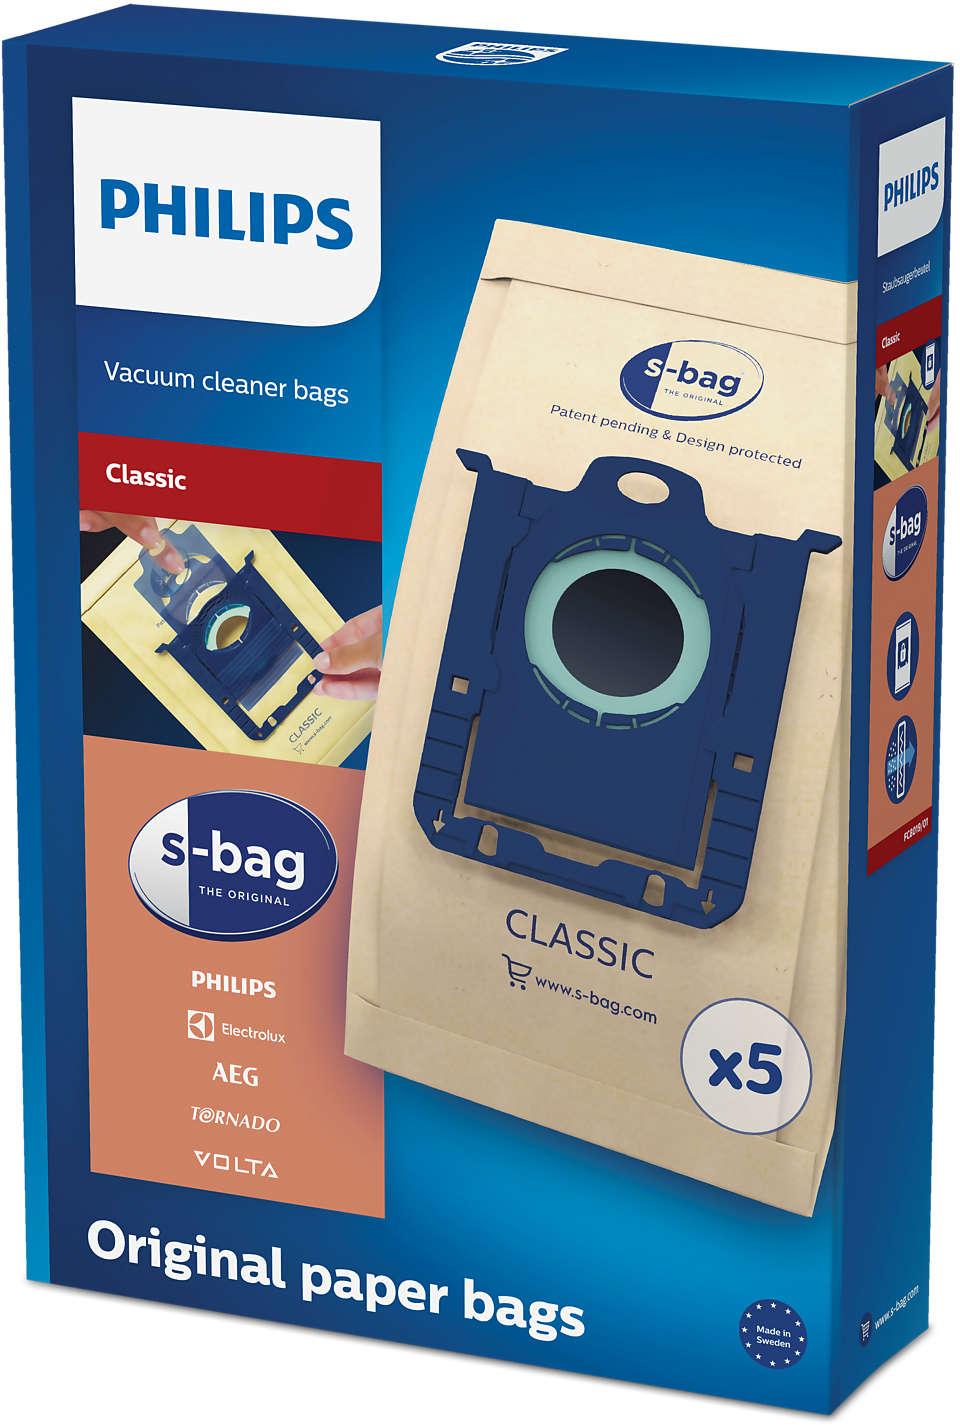 S Bag Vacuum Cleaner Bags Fc8019 01 Philips